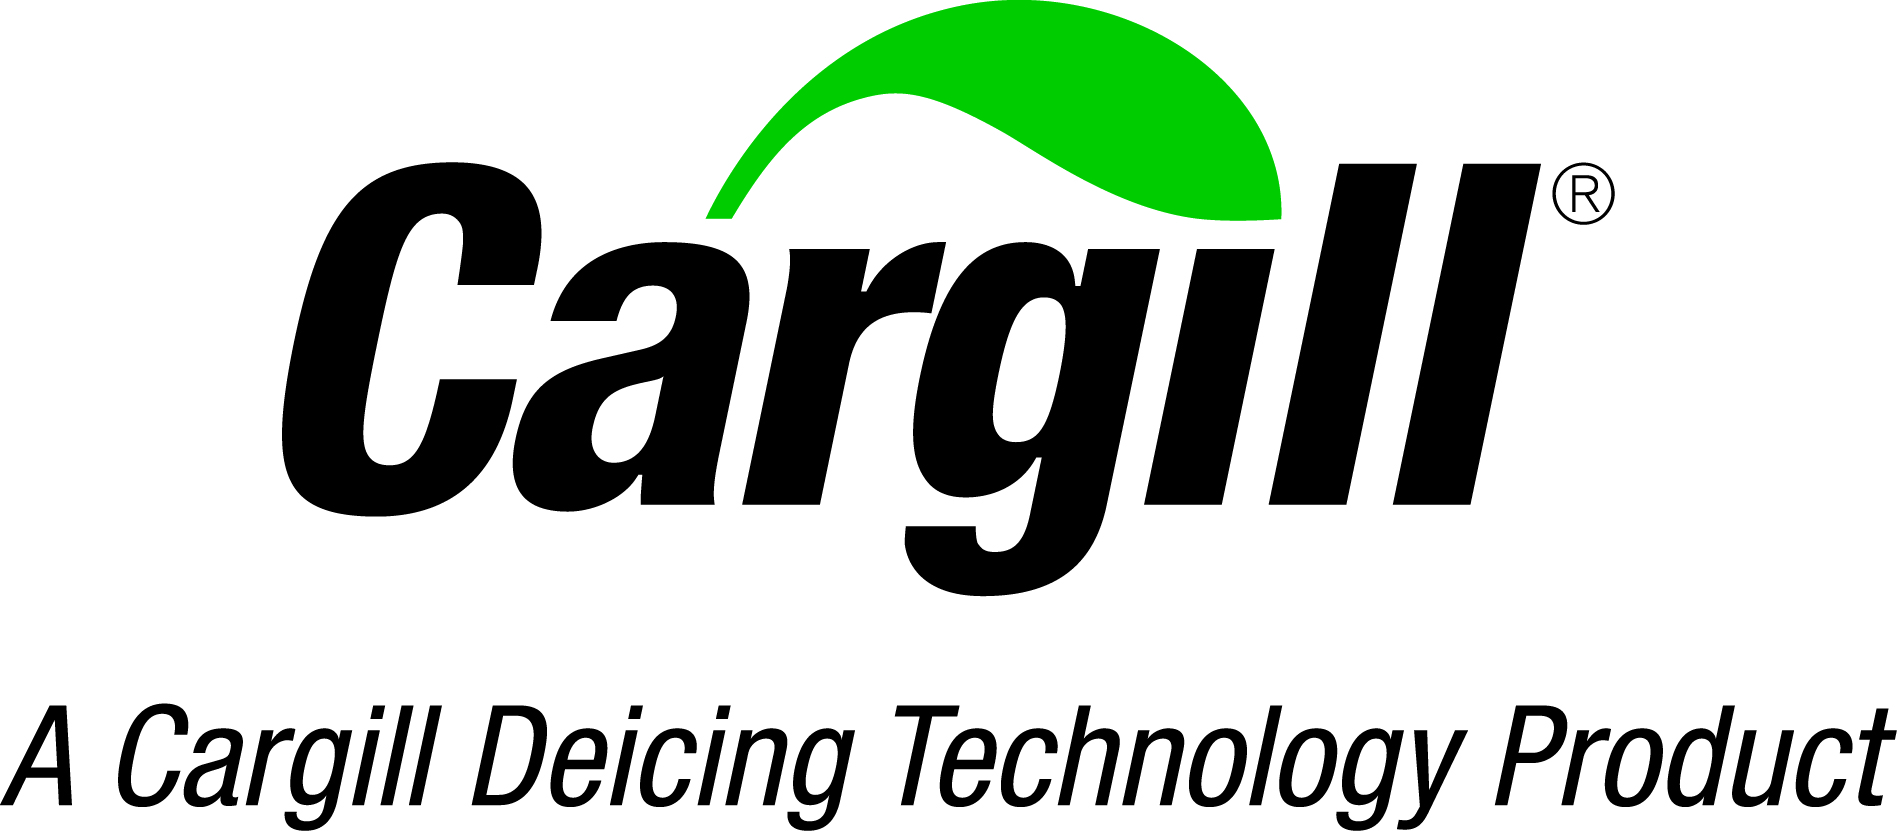 Cargill Deicing Technology logo